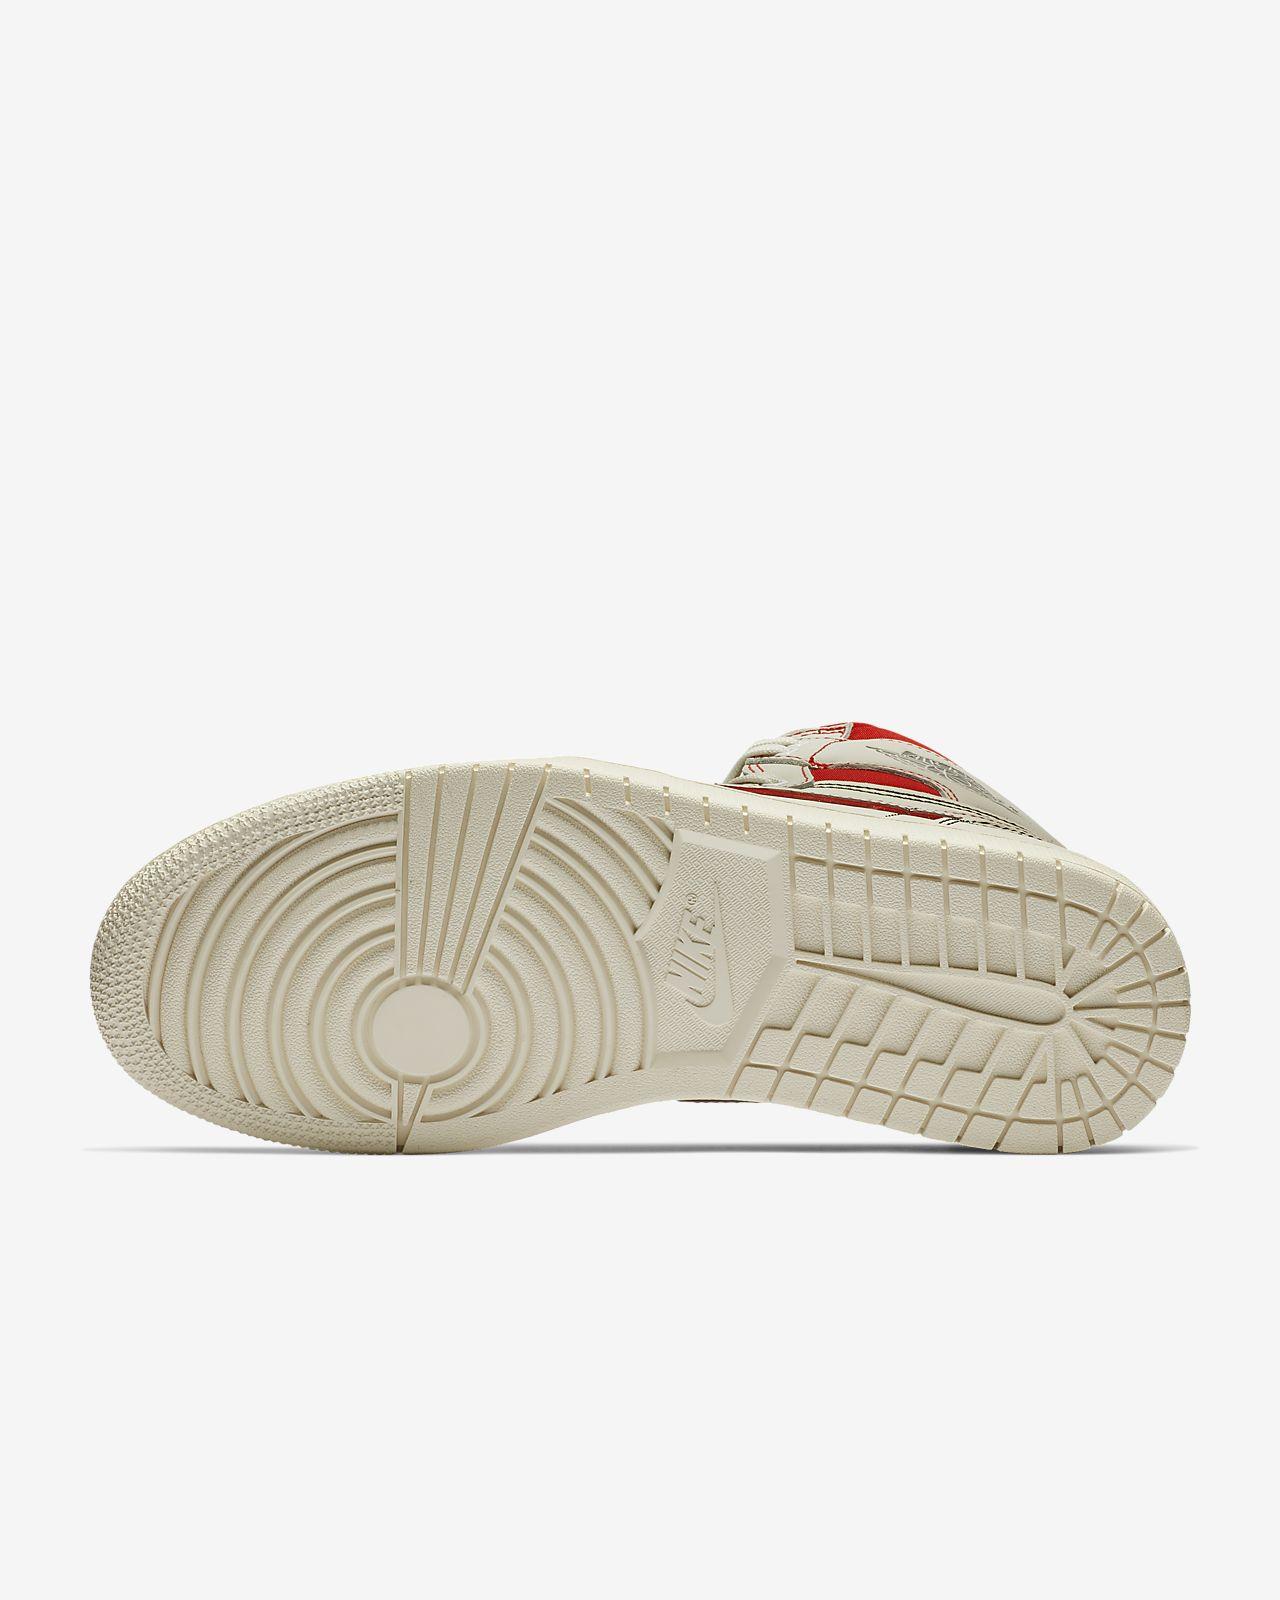 new styles 2385d 0ad97 ... Air Jordan 1 Retro High OG Shoe